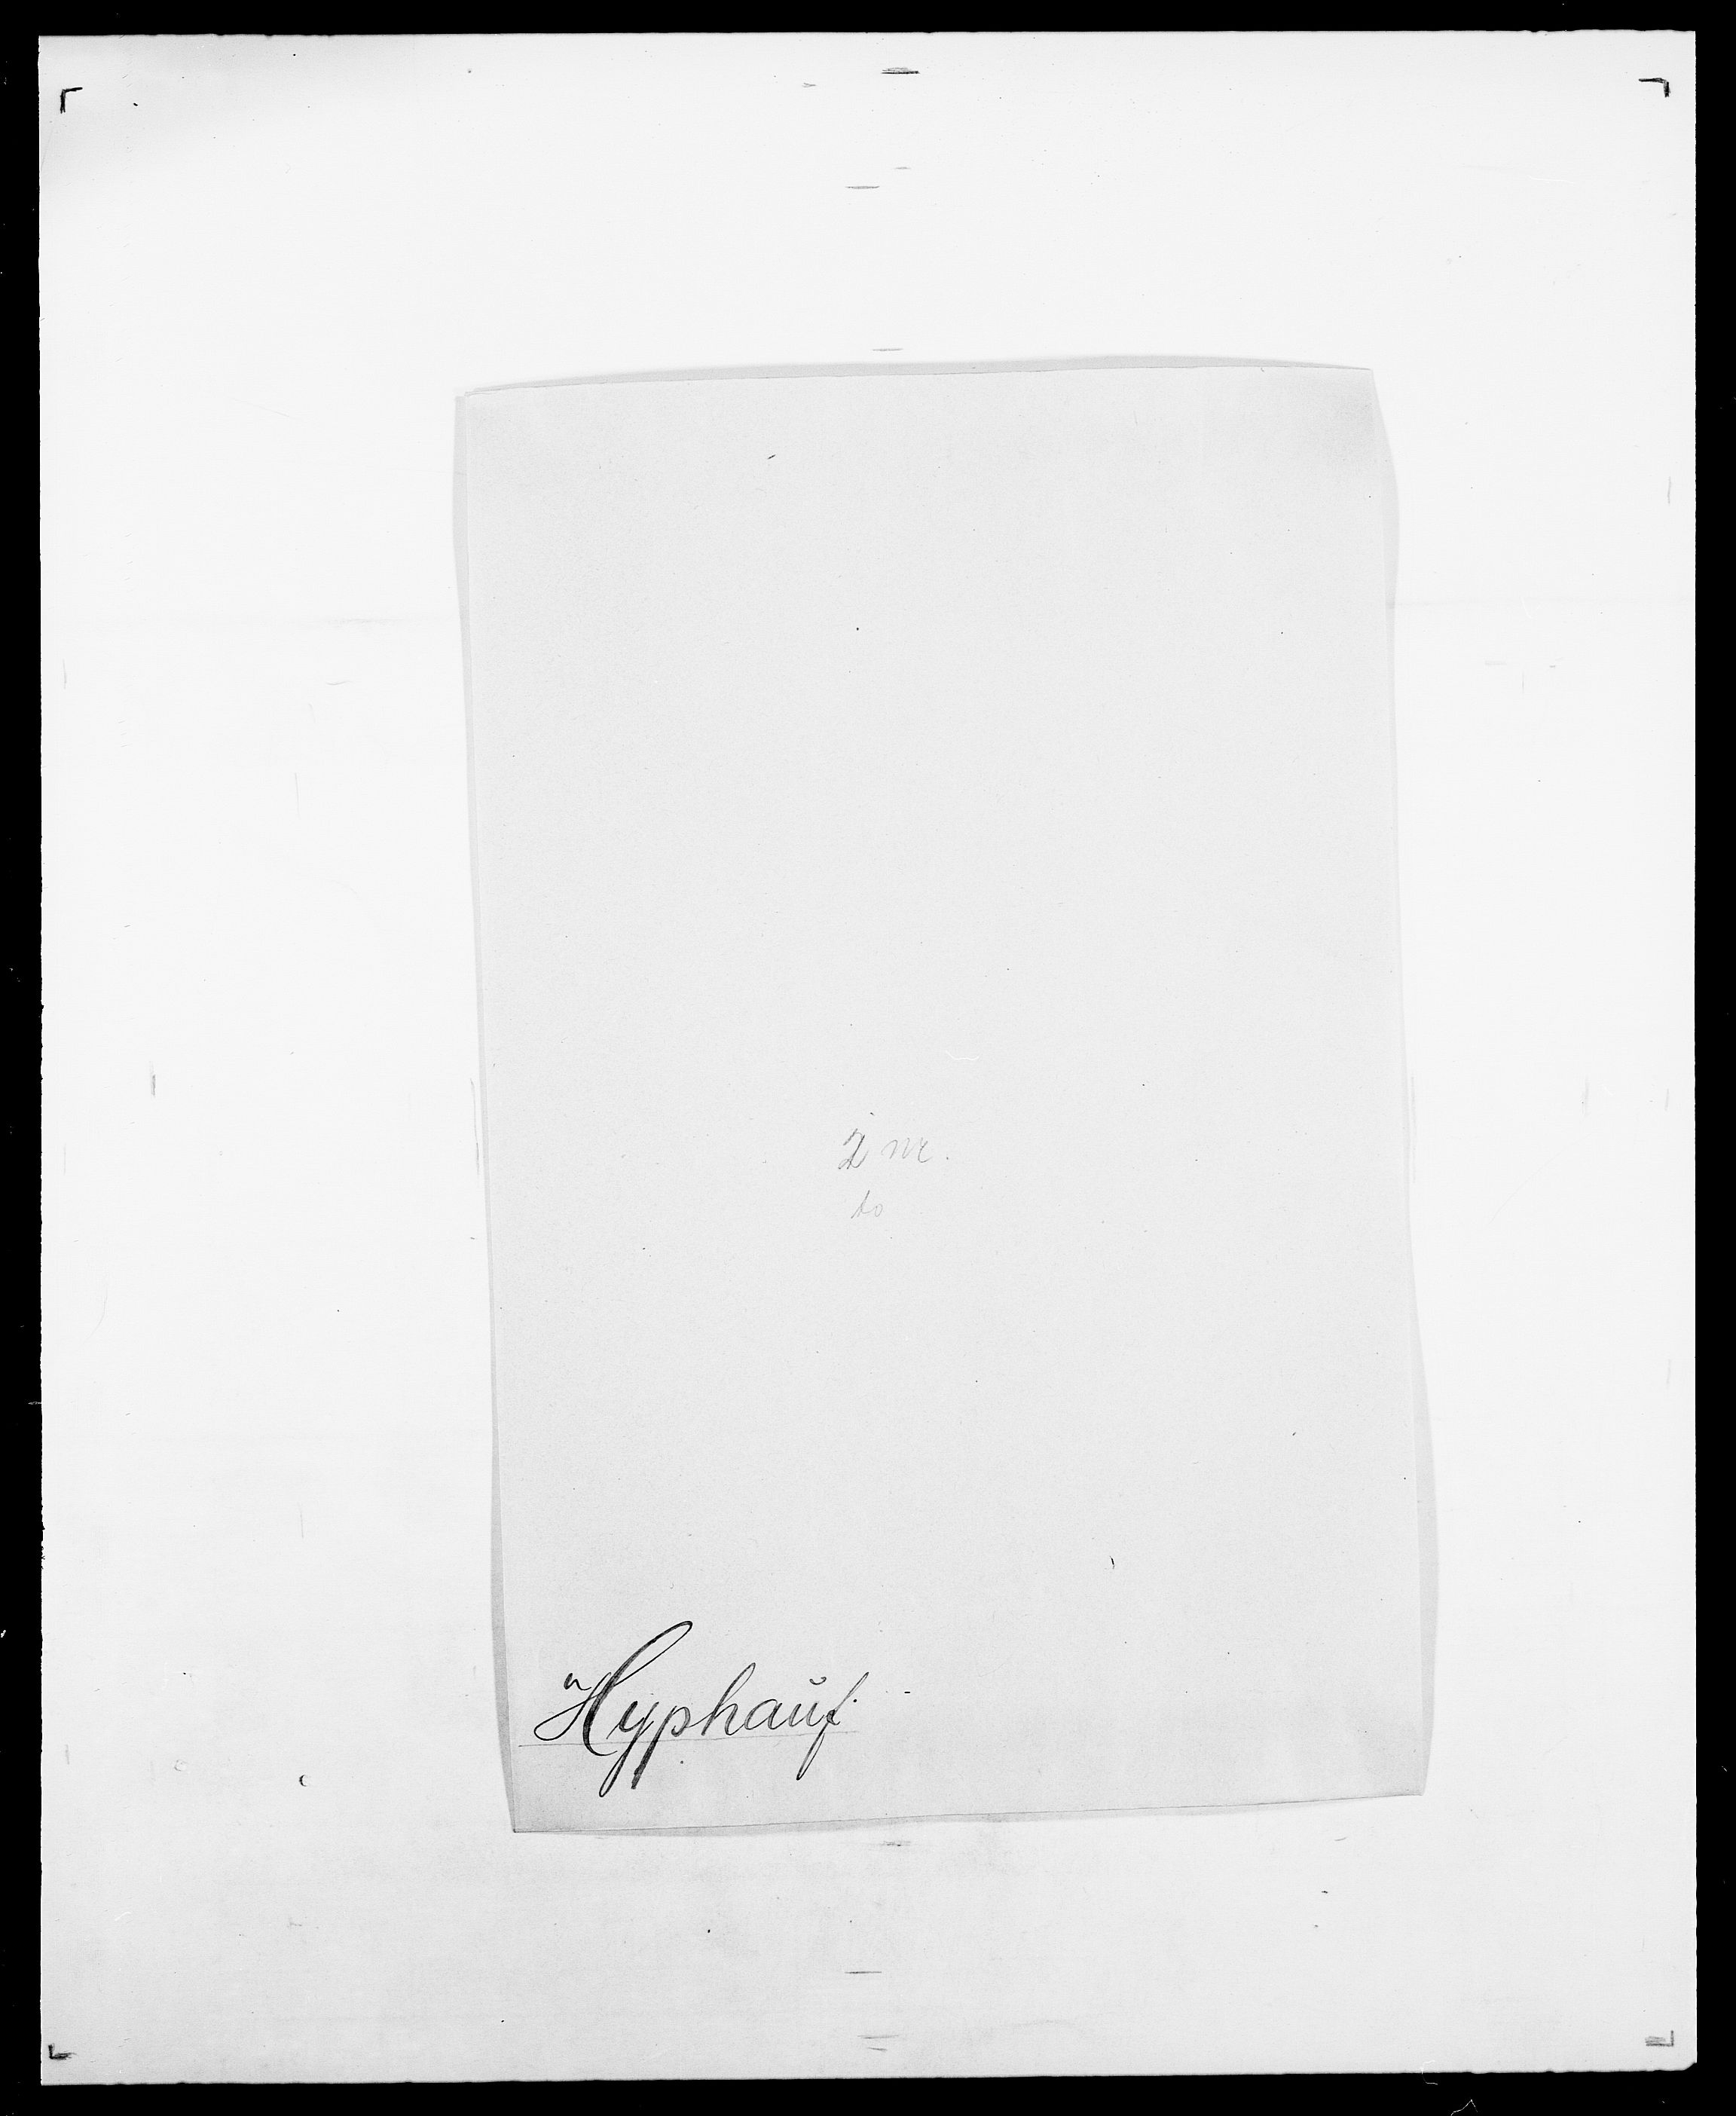 SAO, Delgobe, Charles Antoine - samling, D/Da/L0019: van der Hude - Joys, s. 290